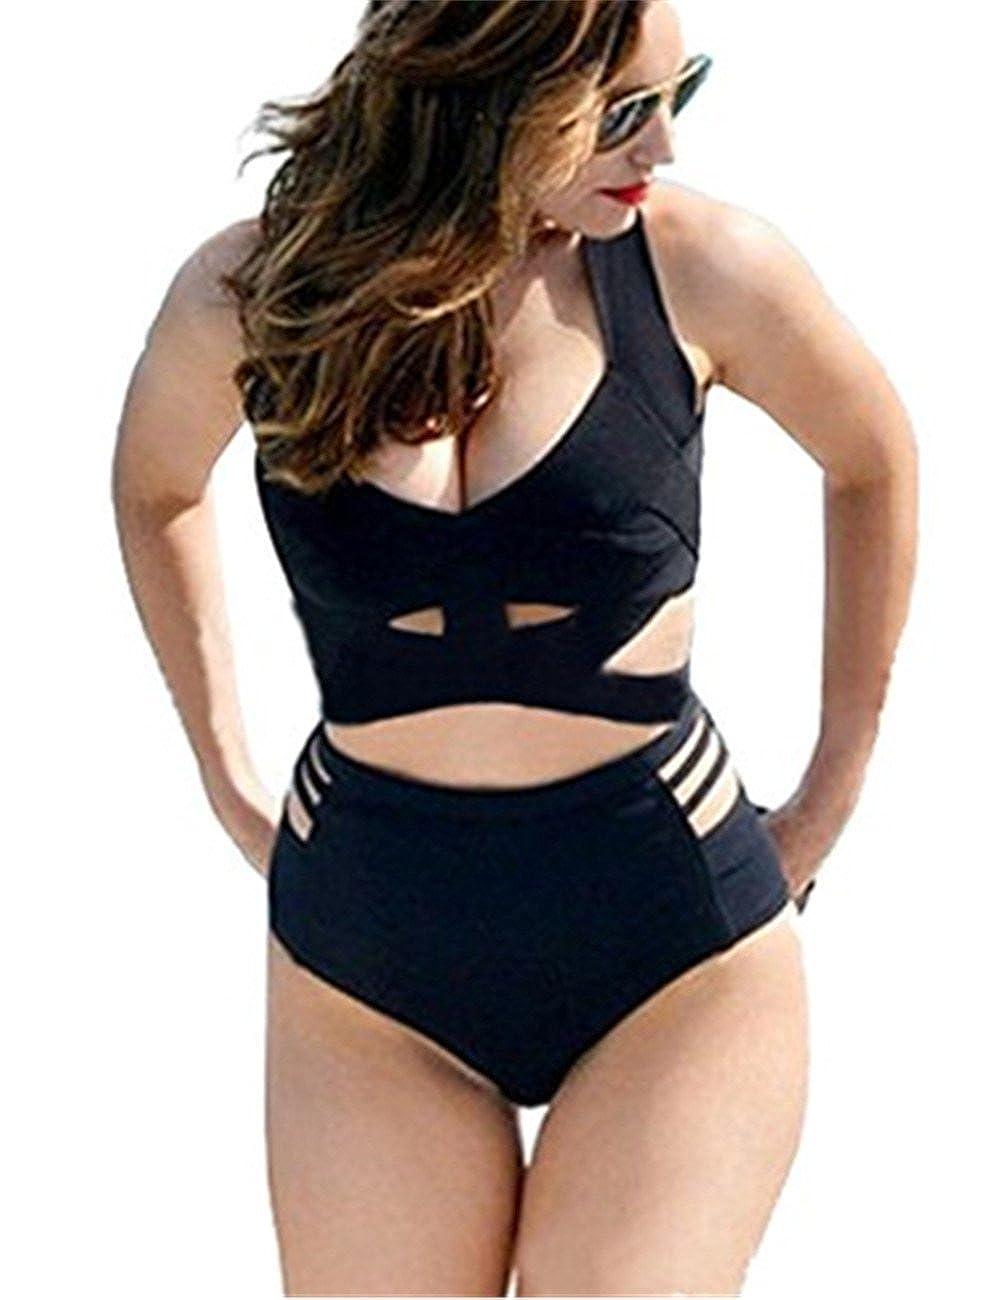 60869d06005 Amazon.com: GWELL High Waist Push up Women's Slimming Bikini Set 2 Piece  Swimsuit: Clothing